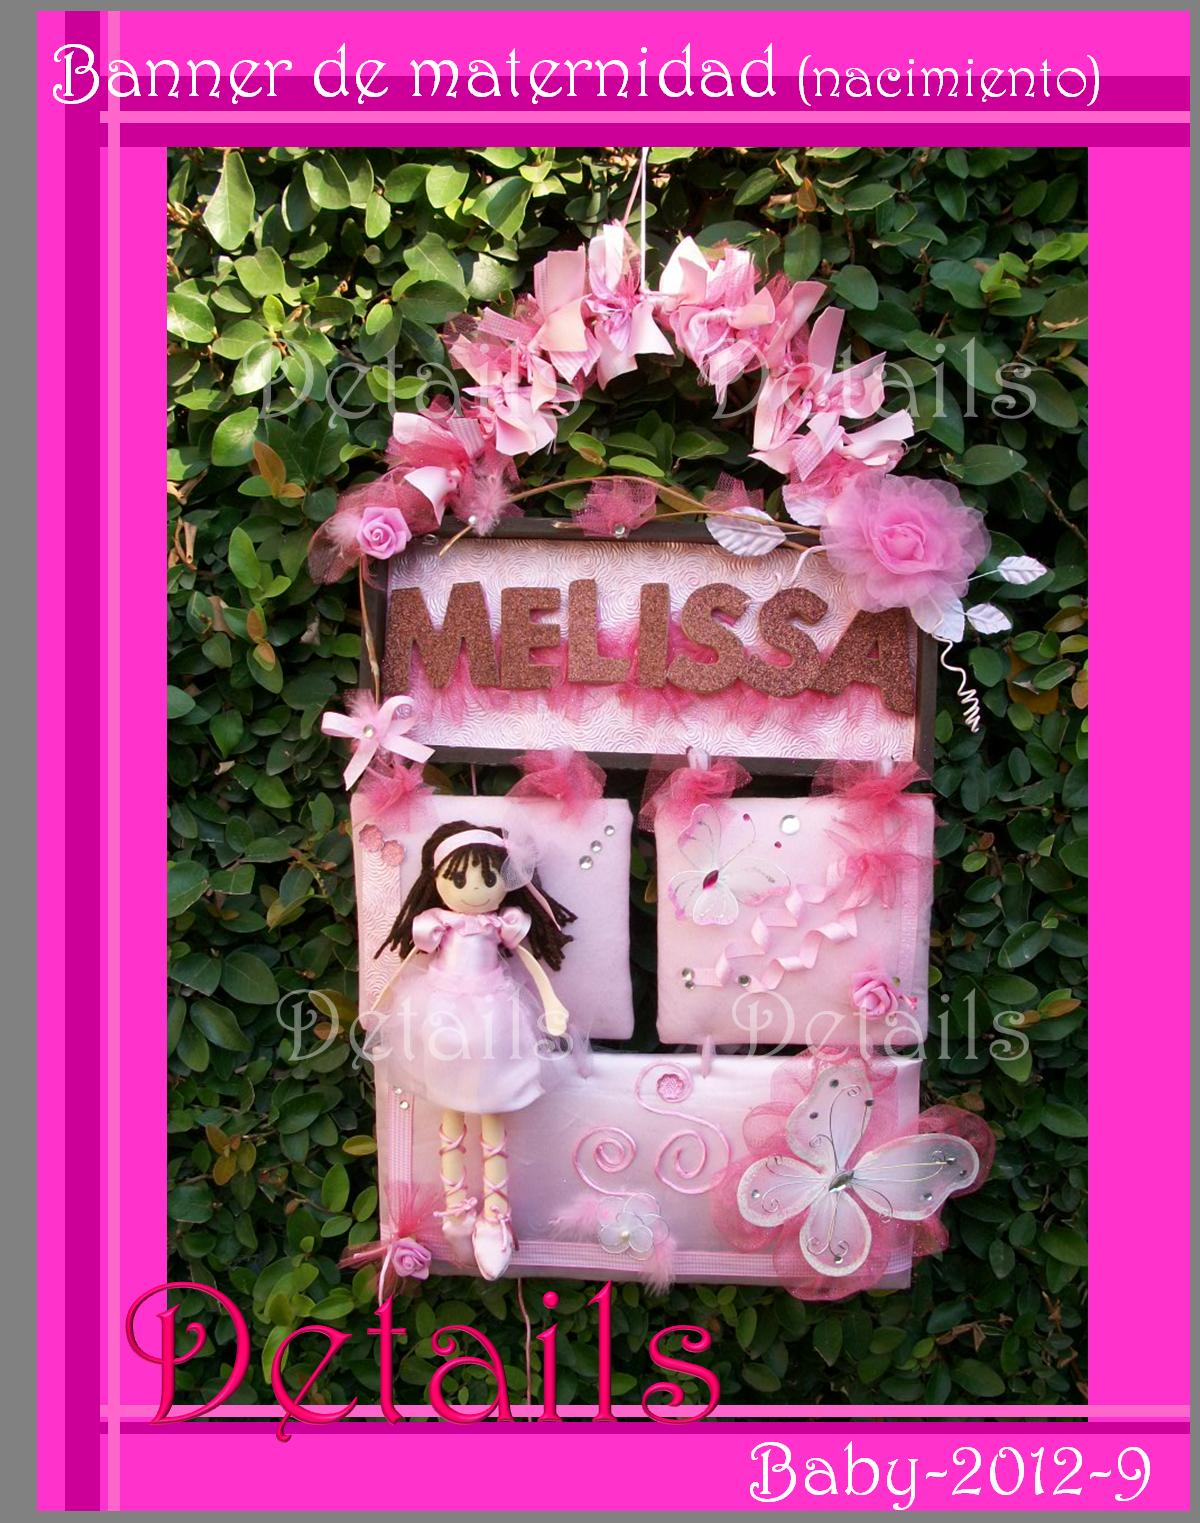 banner maternidad para puerta o decoracin bailarina de ballet details souvenirs facebook contctanos https